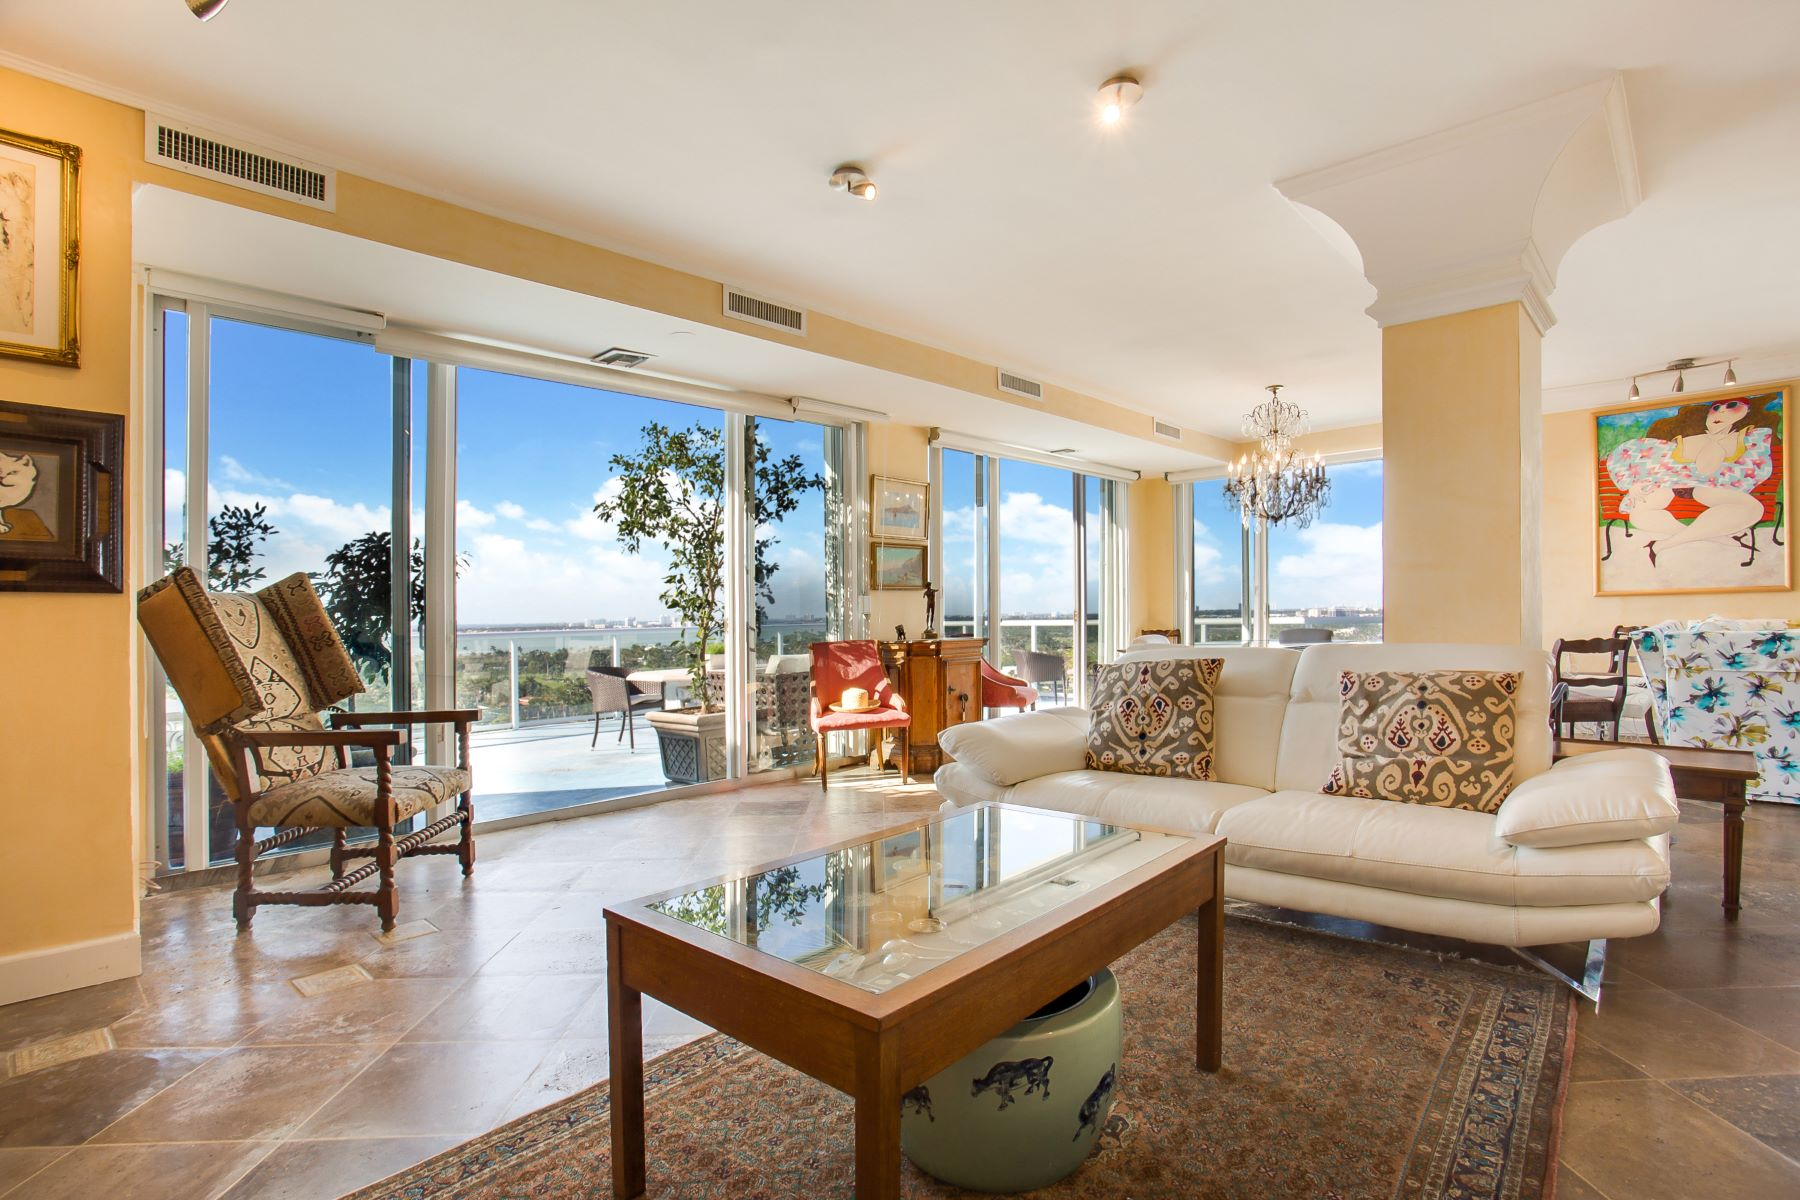 Condominium for Sale at 5001 Collins Ave 5001 Collins Ave PH-1, Miami Beach, Florida, 33140 United States